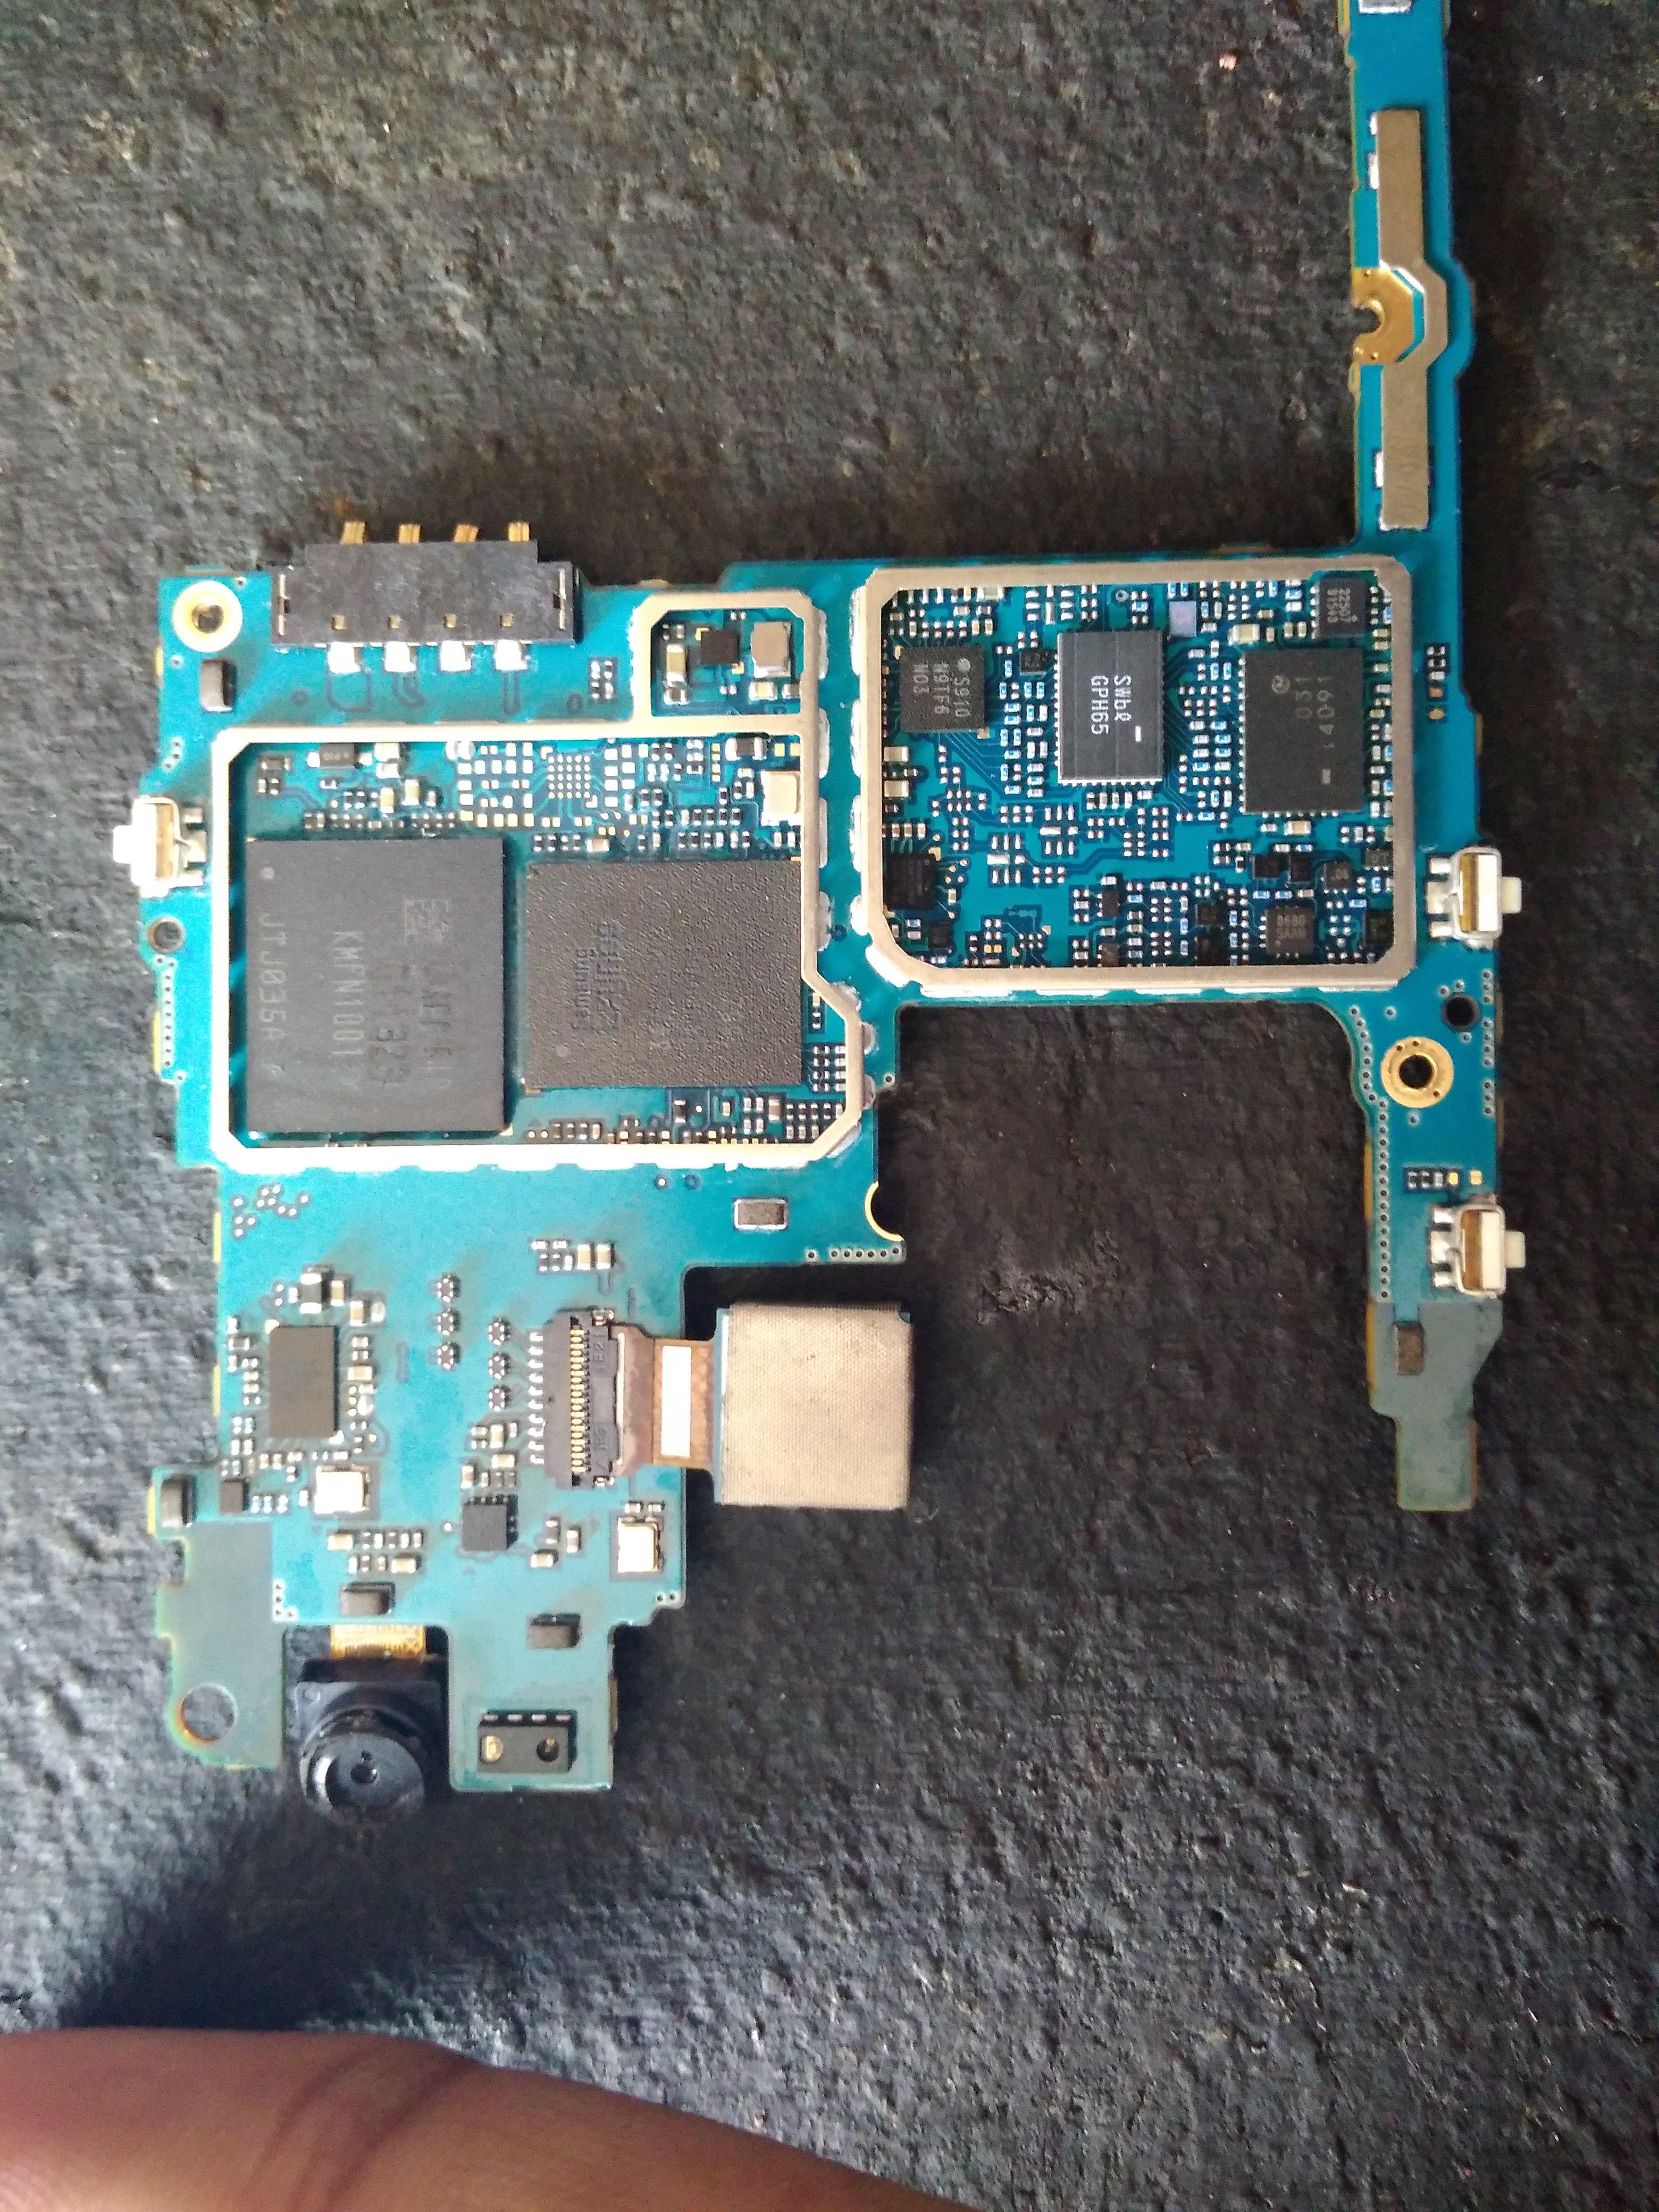 Samsung J2 Pcb  U0938 U0948 U092e U0938 U0902 U0917 J2  U092a U0940 U0938 U0940 U092c U0940